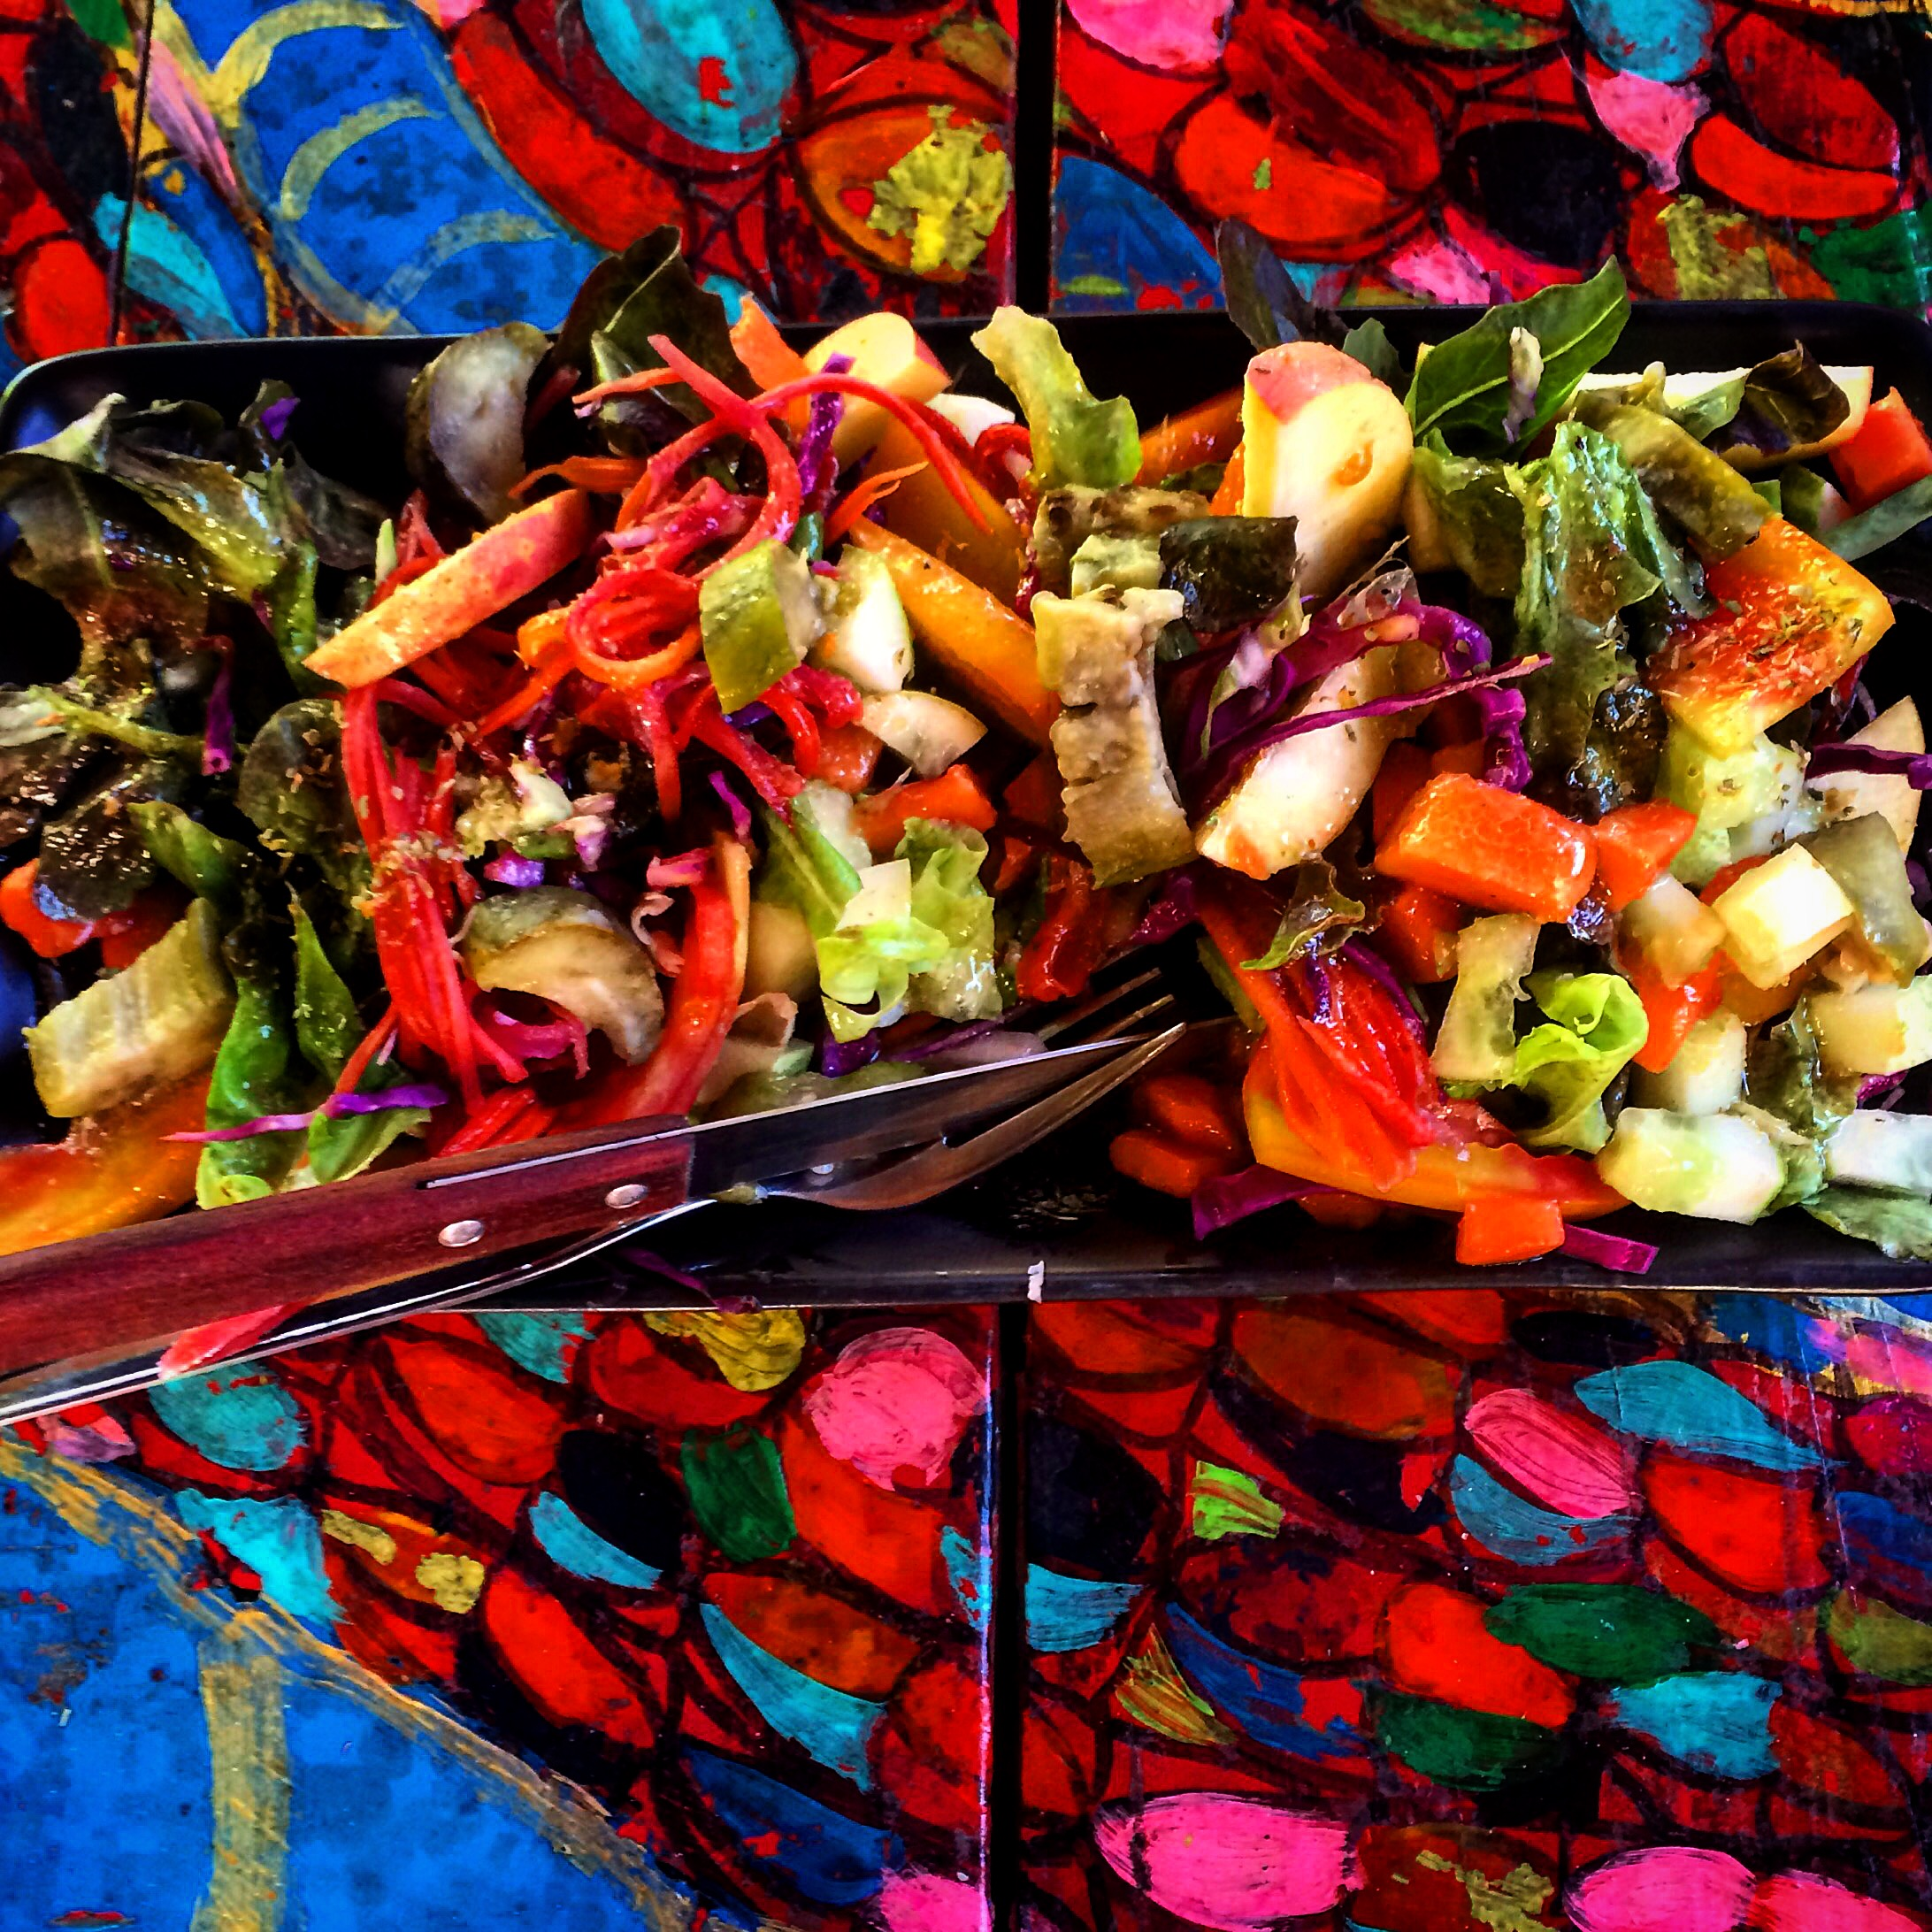 Kunda Salad: eggplant, papaya, tomato, lettuce, apple, cabbage, herbs & a tamarind dressing.